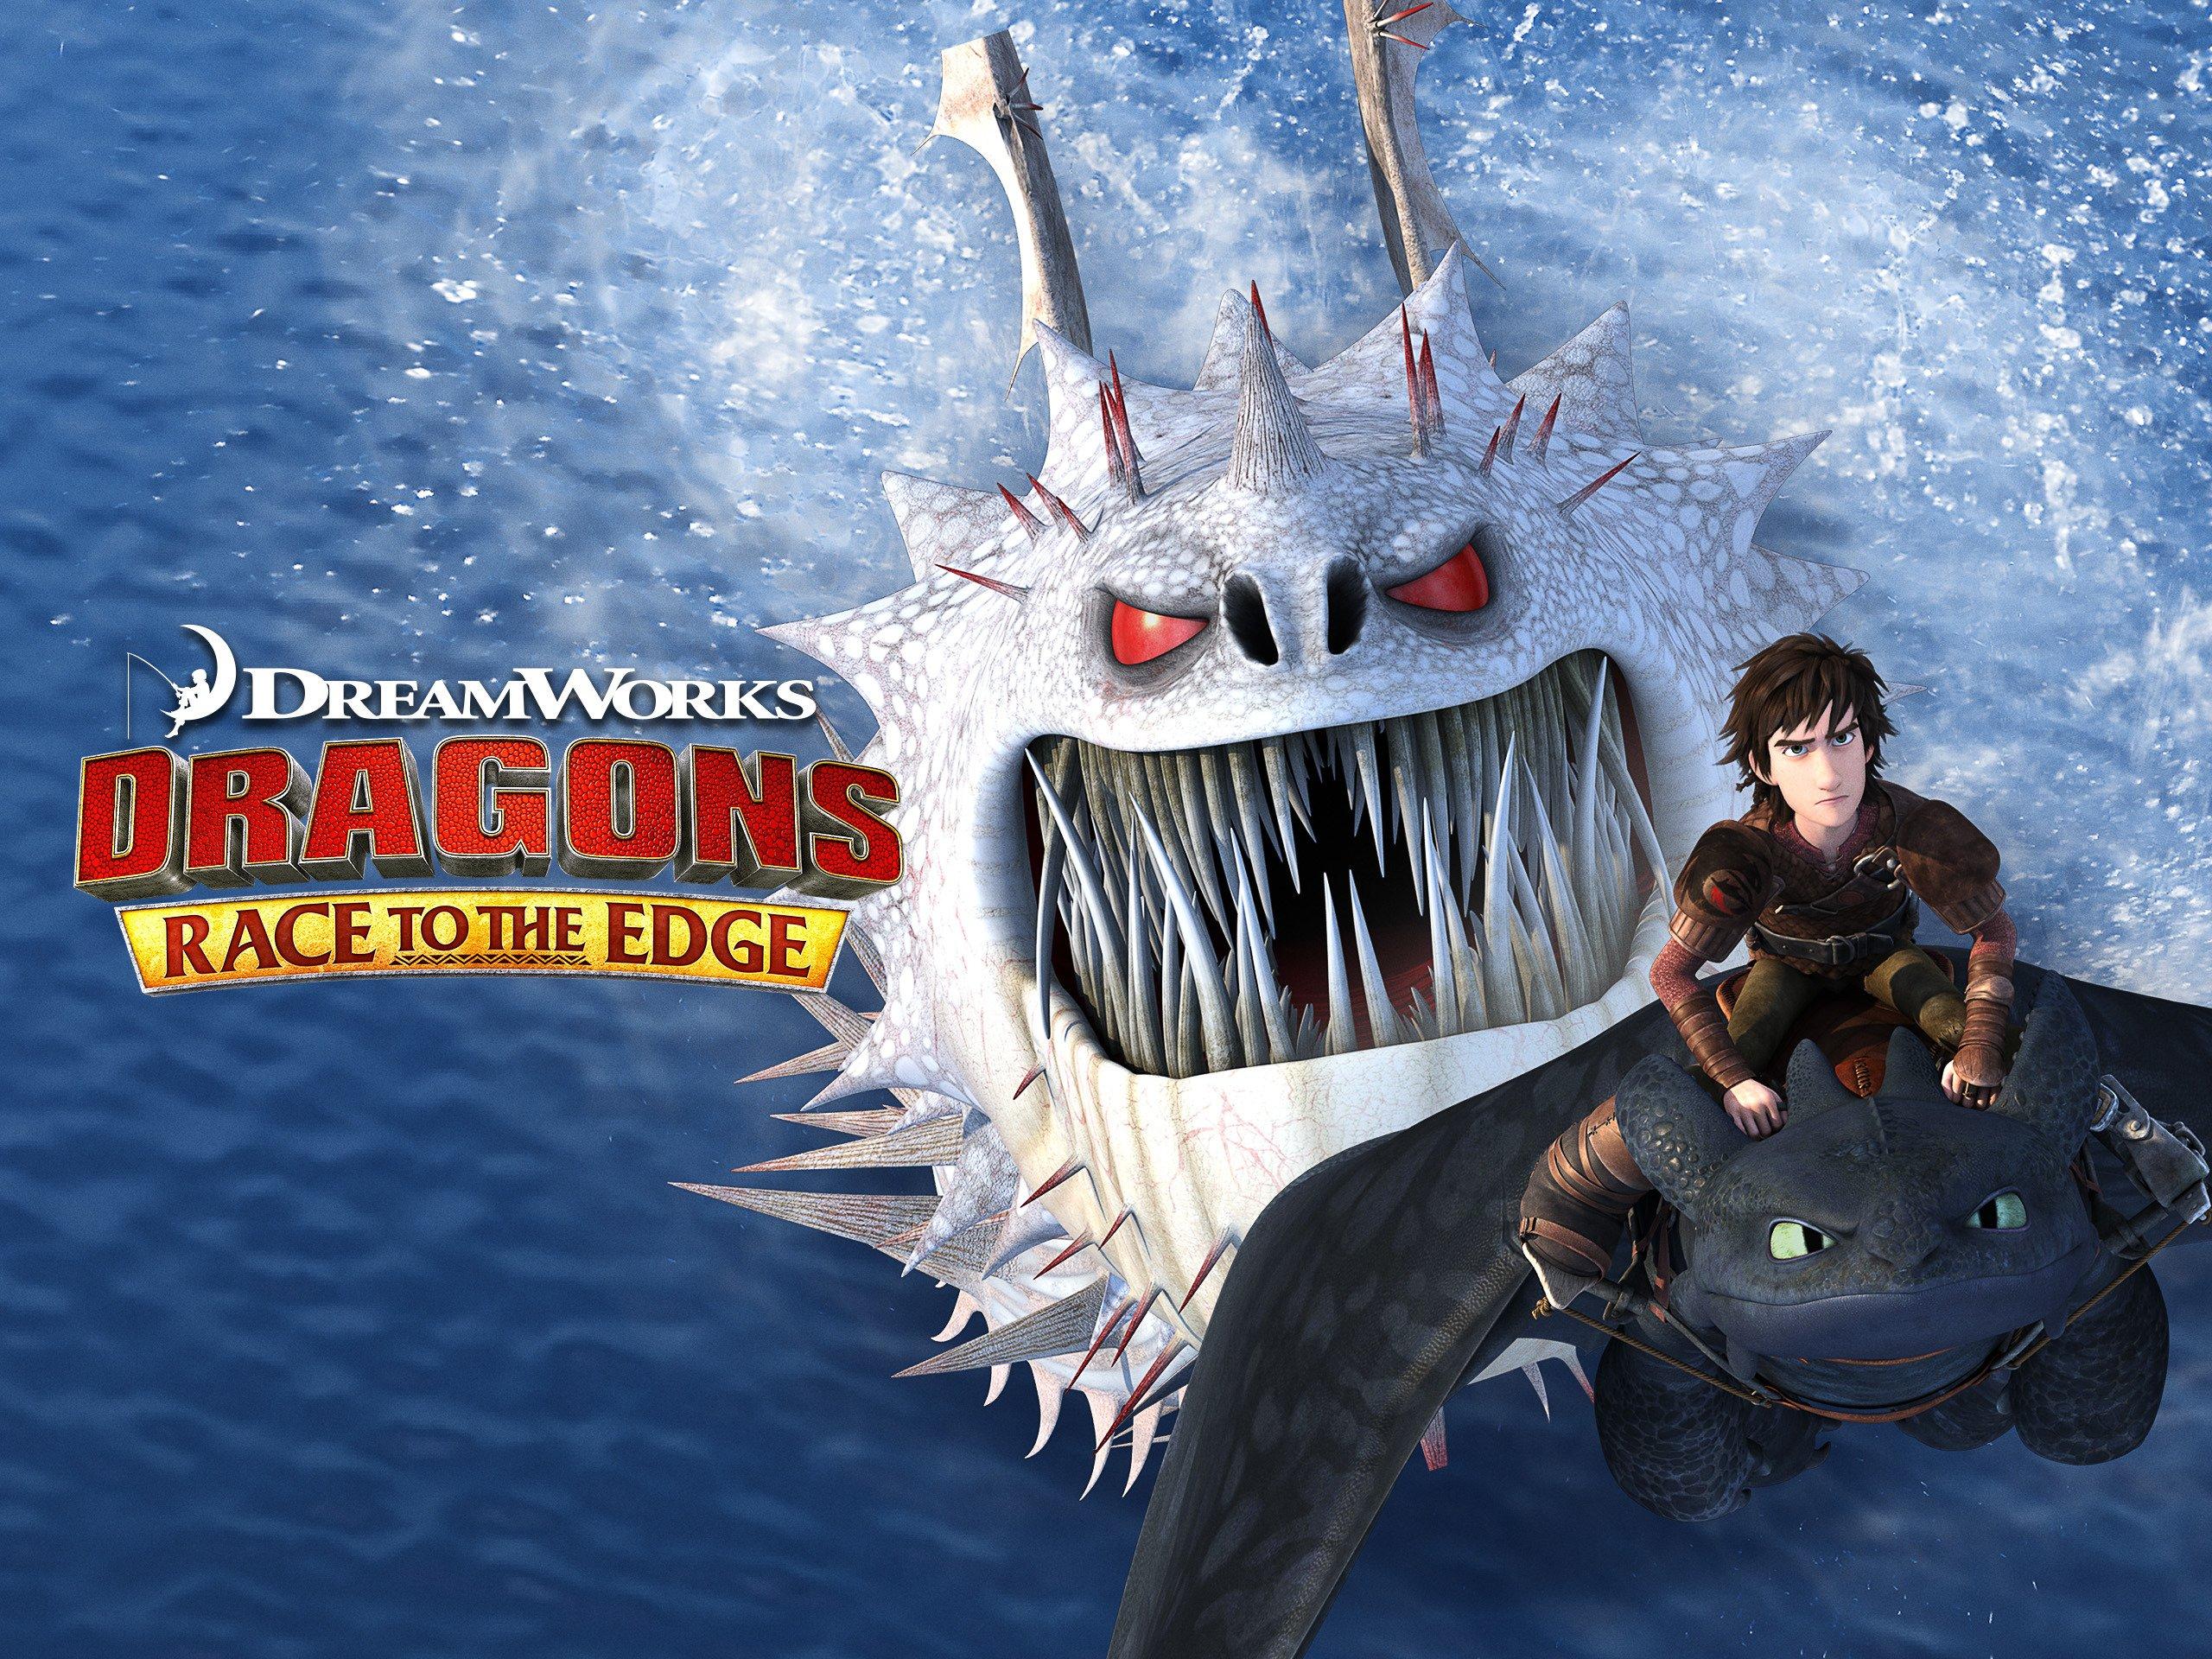 dragons race to the edge season 7 episode 13